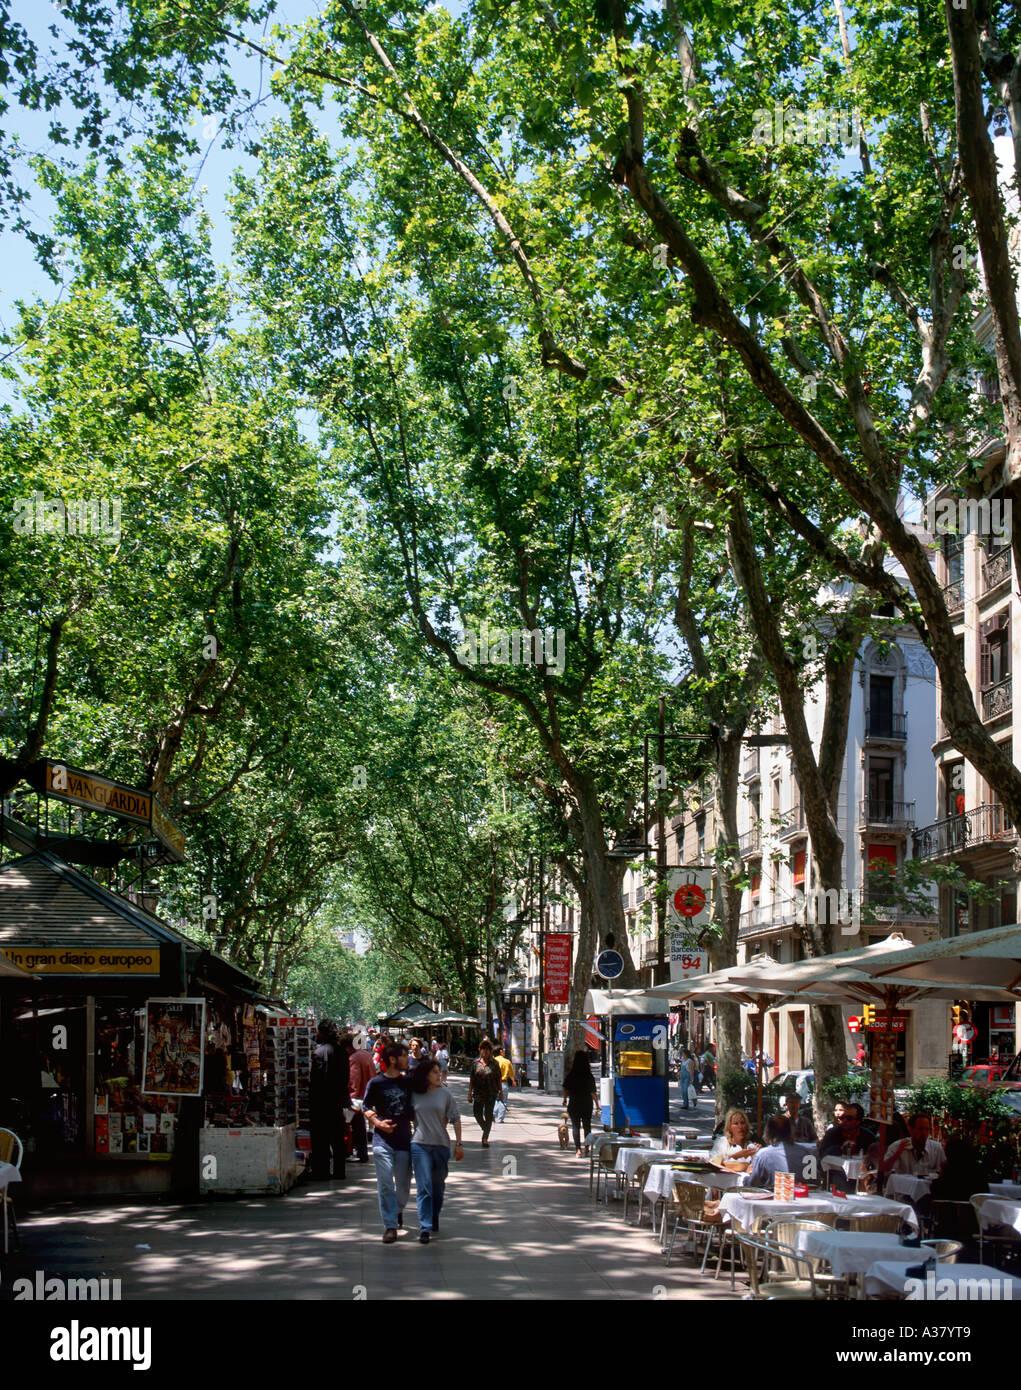 Restaurant and Kiosk on La Rambla (Las Ramblas), Barcelona, Catalunya, Spain - Stock Image